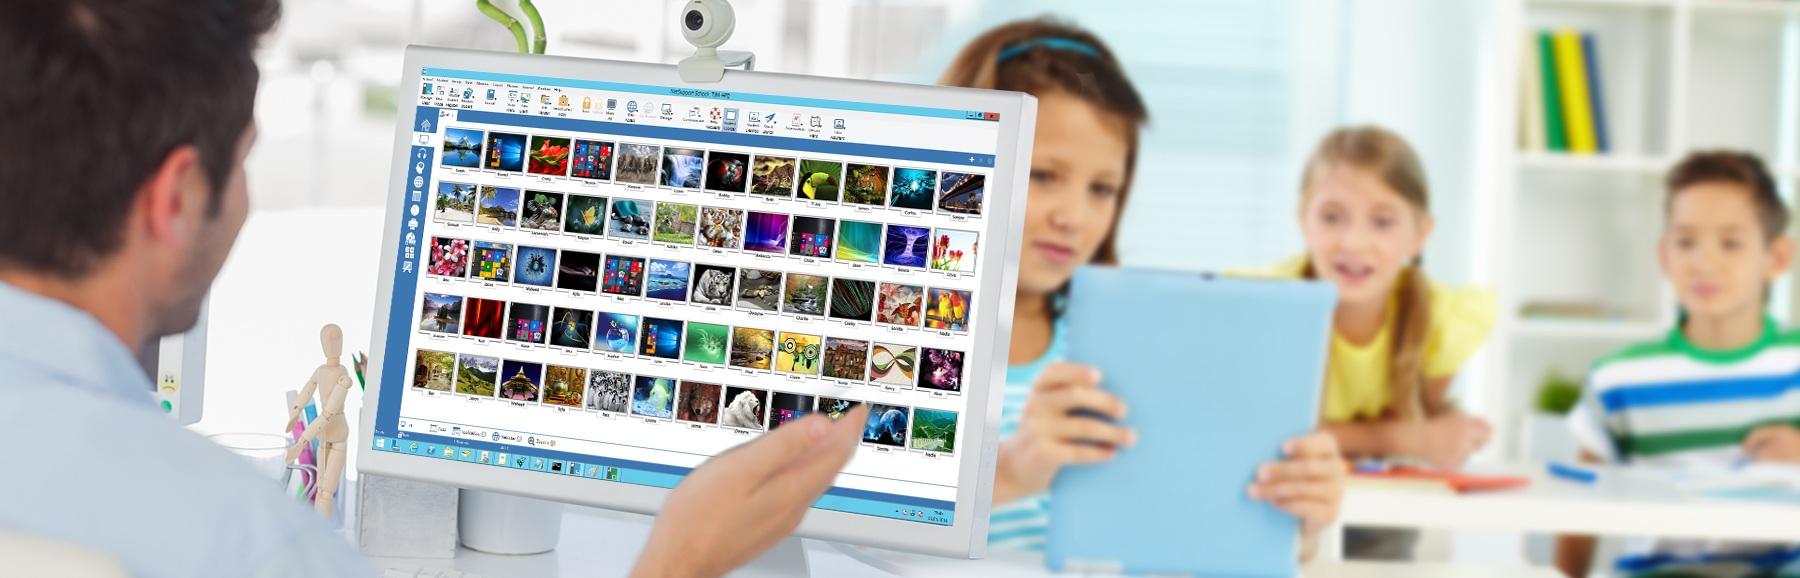 Monitor | NetSupport School